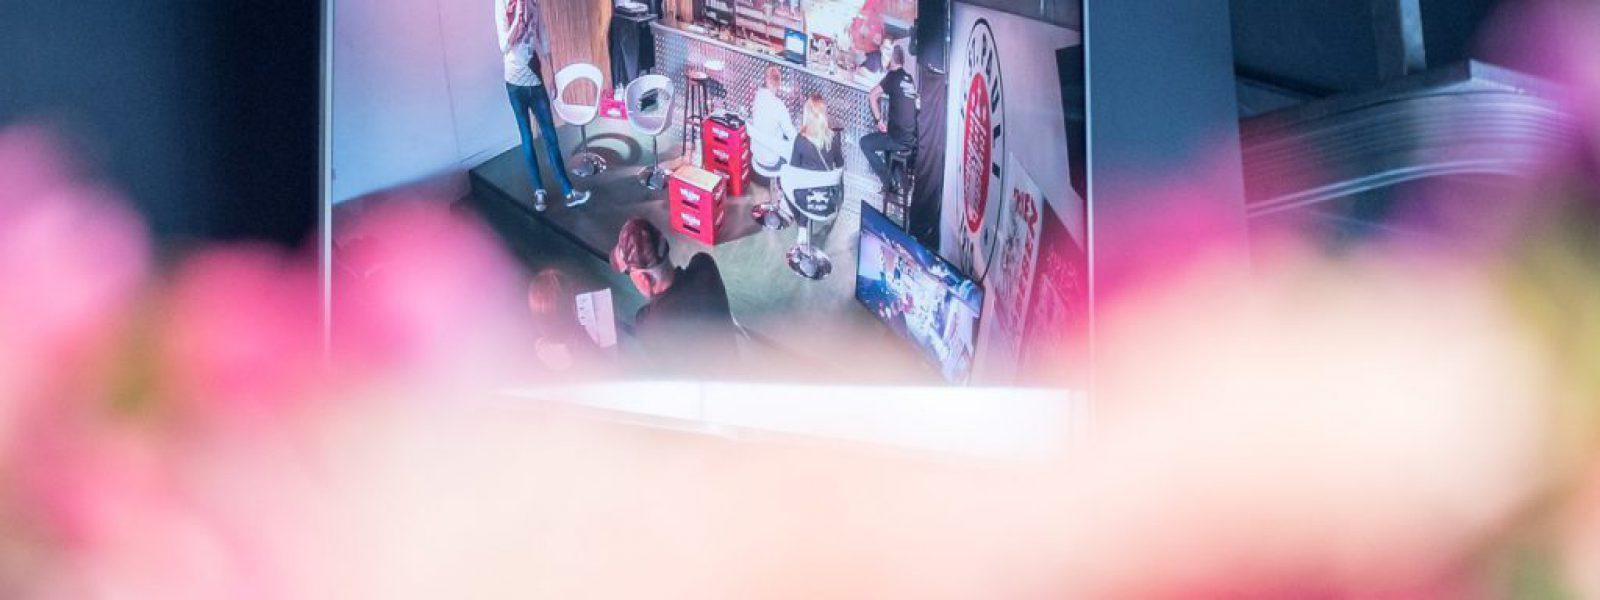 LNDM 2019 FCSPMuseum (Sabrina A Nagel) - 12